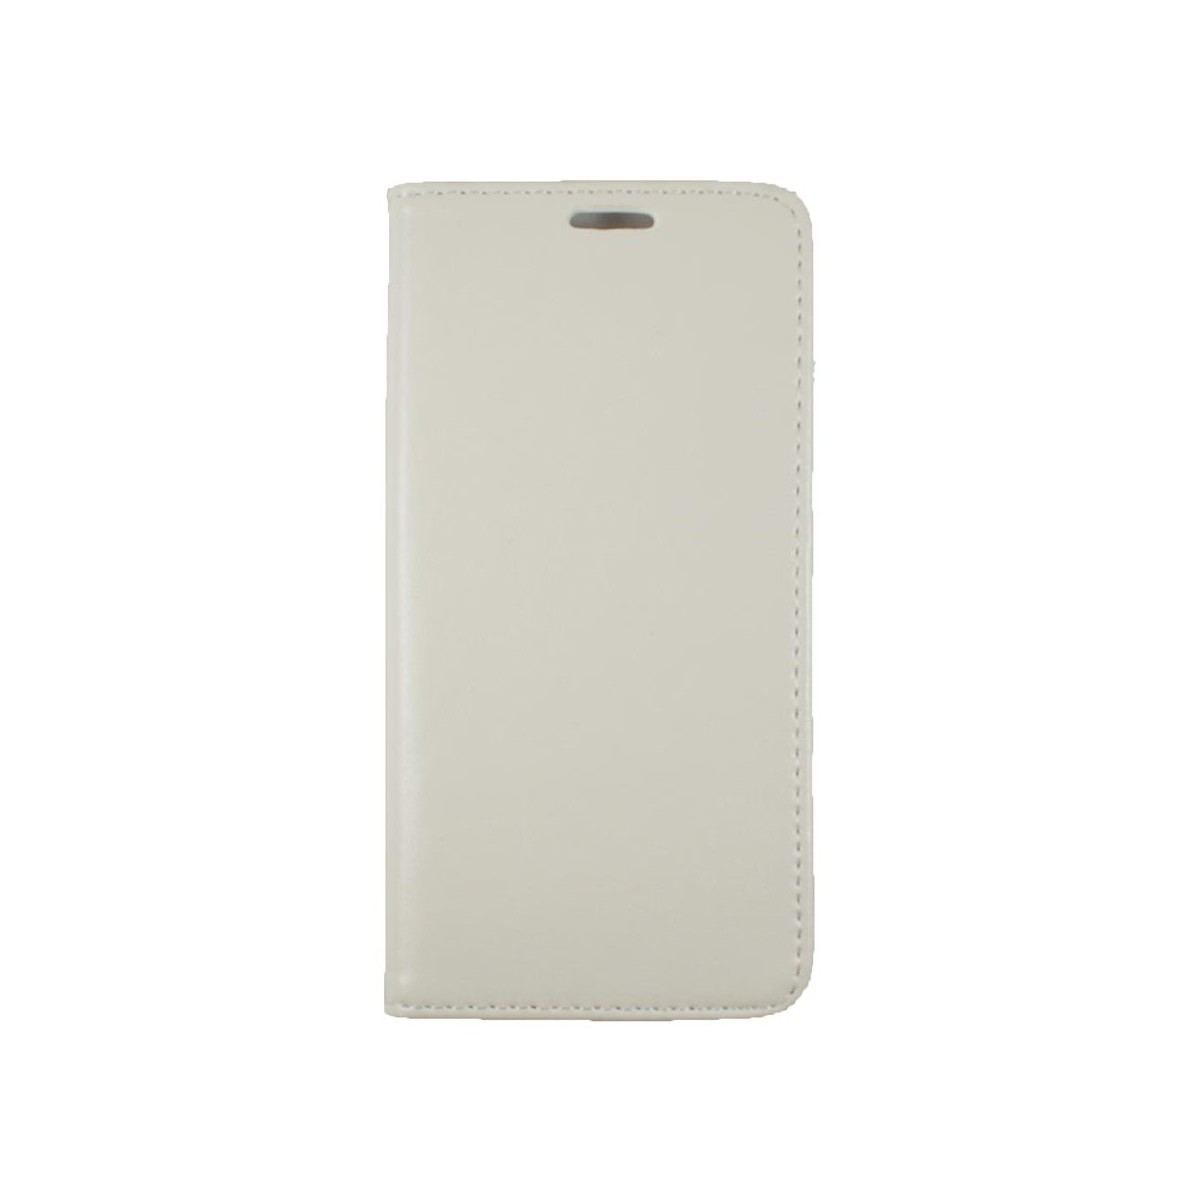 Etui iPhone Galaxy J5 (2017) Porte-cartes Blanc - Crazy Kase